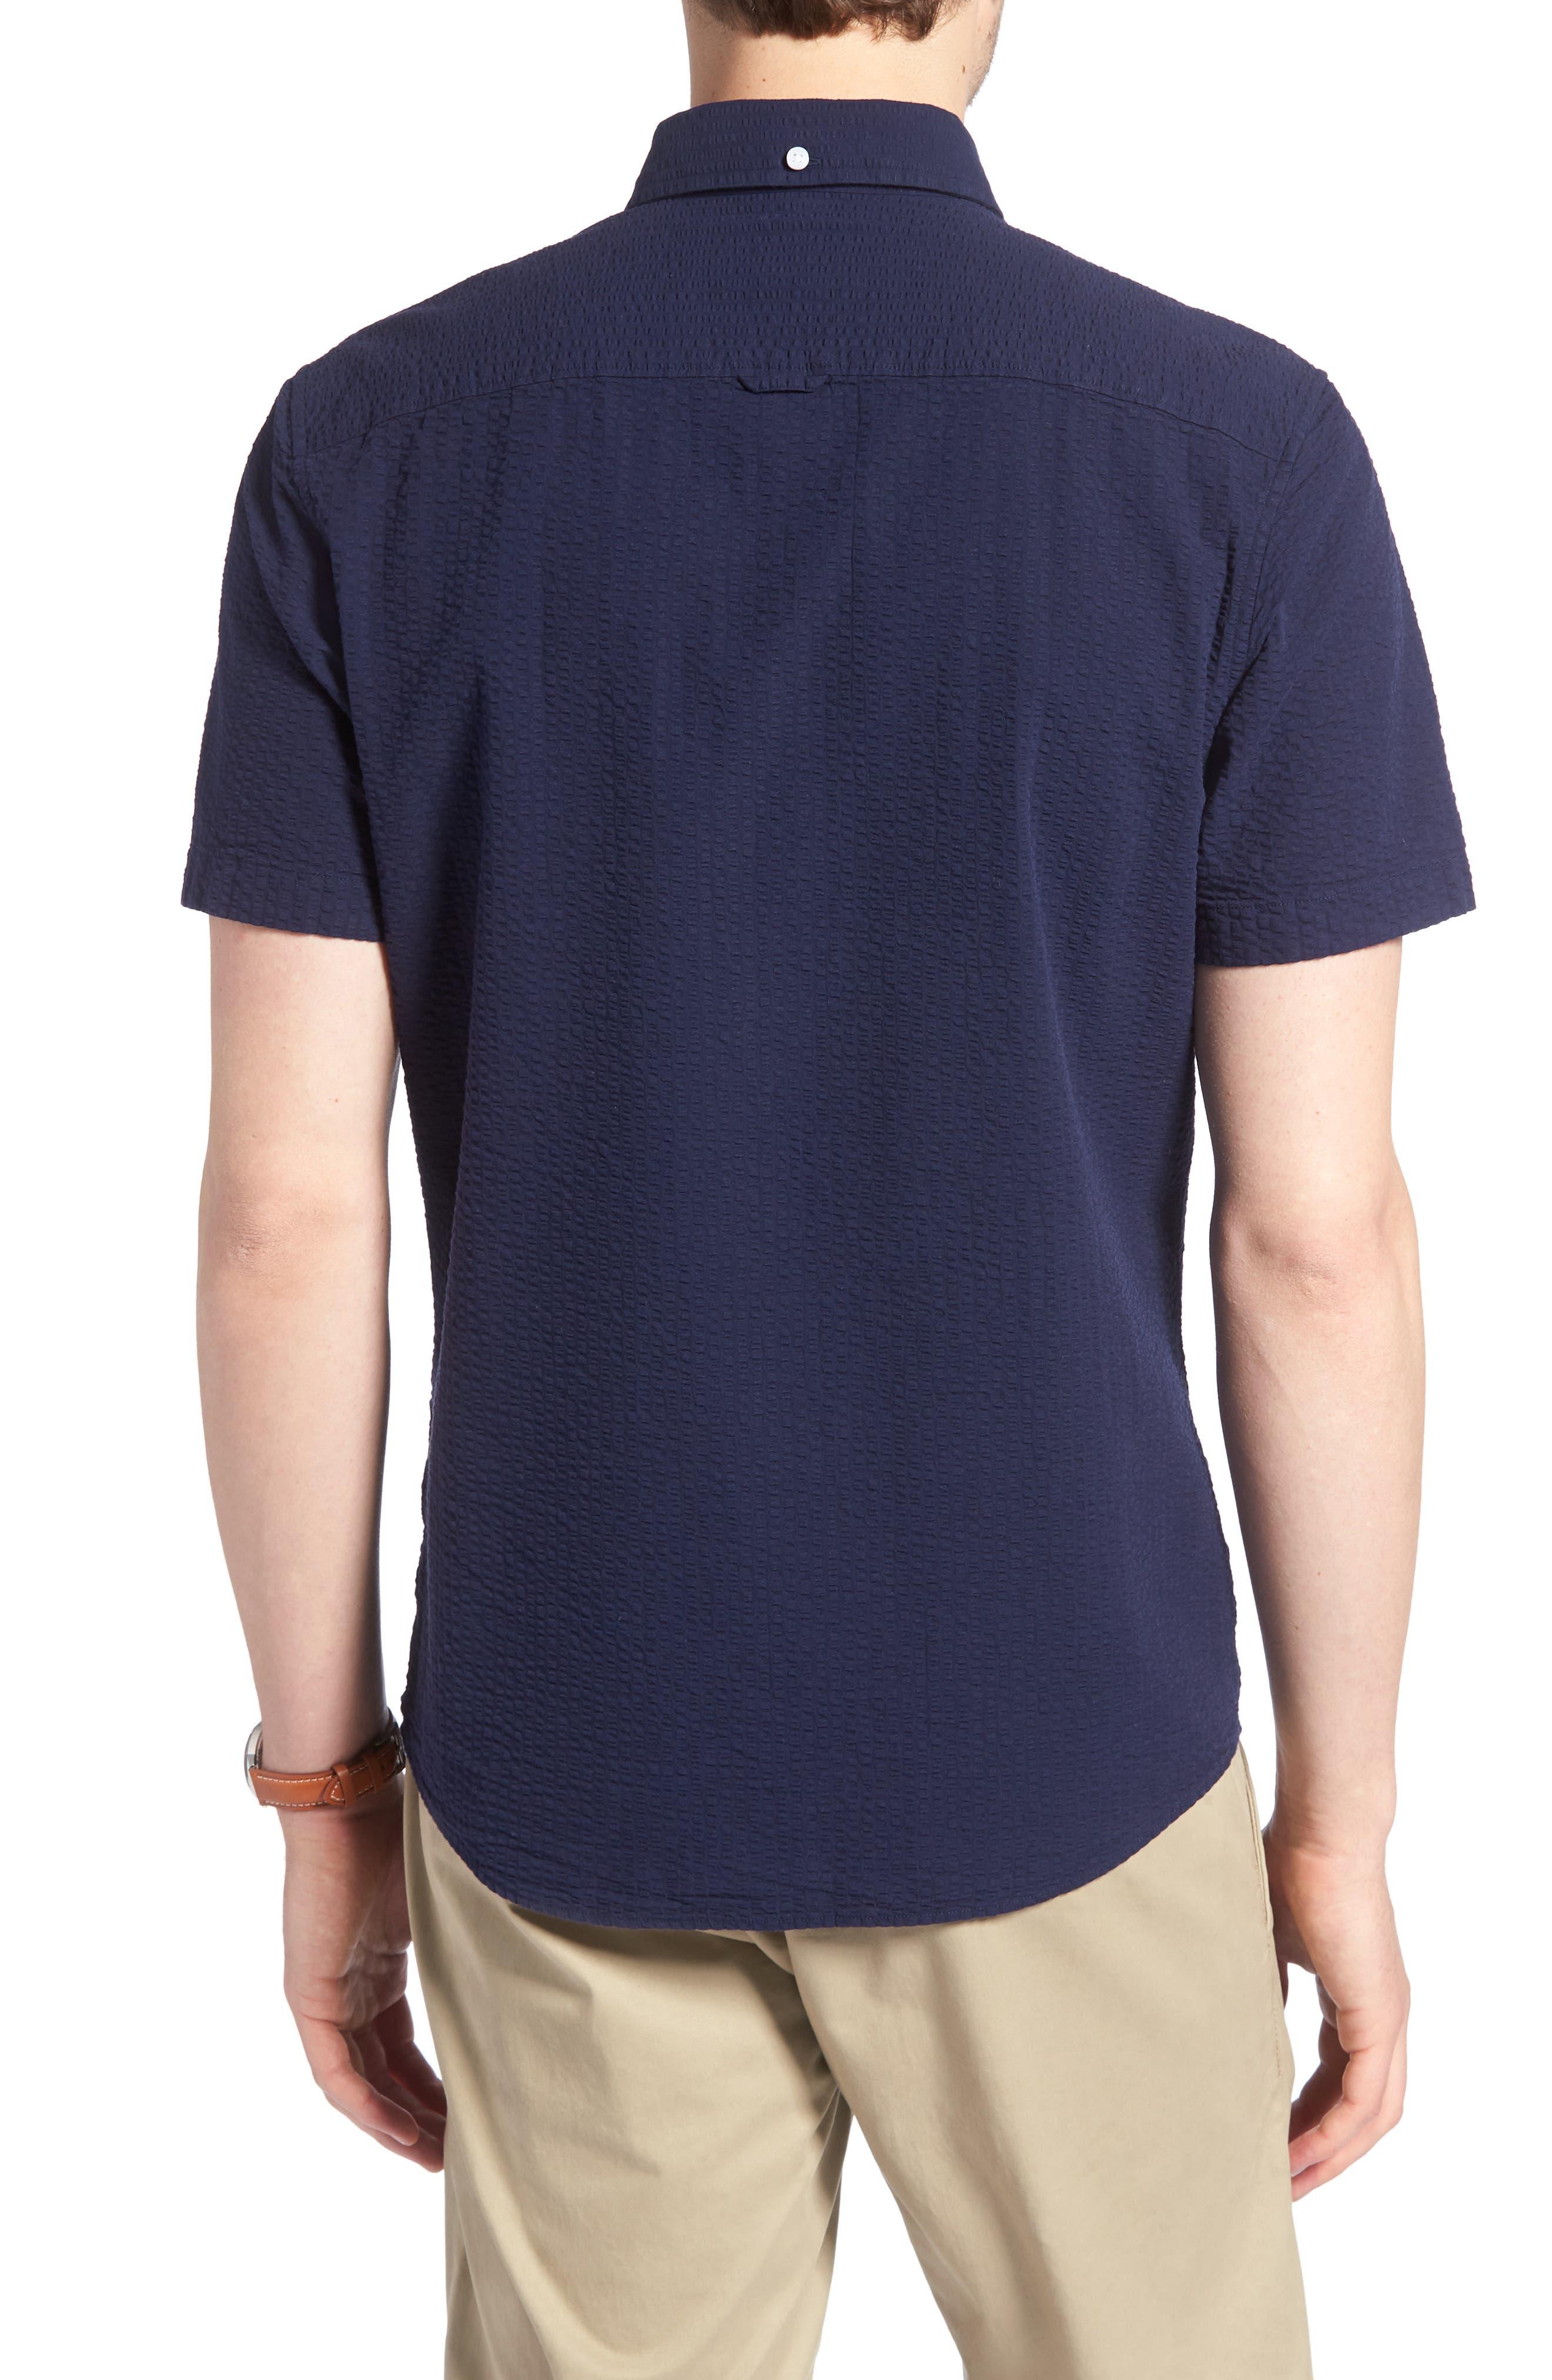 Trim Fit Seersucker Sport Shirt,                             Alternate thumbnail 3, color,                             Navy Iris Seersucker